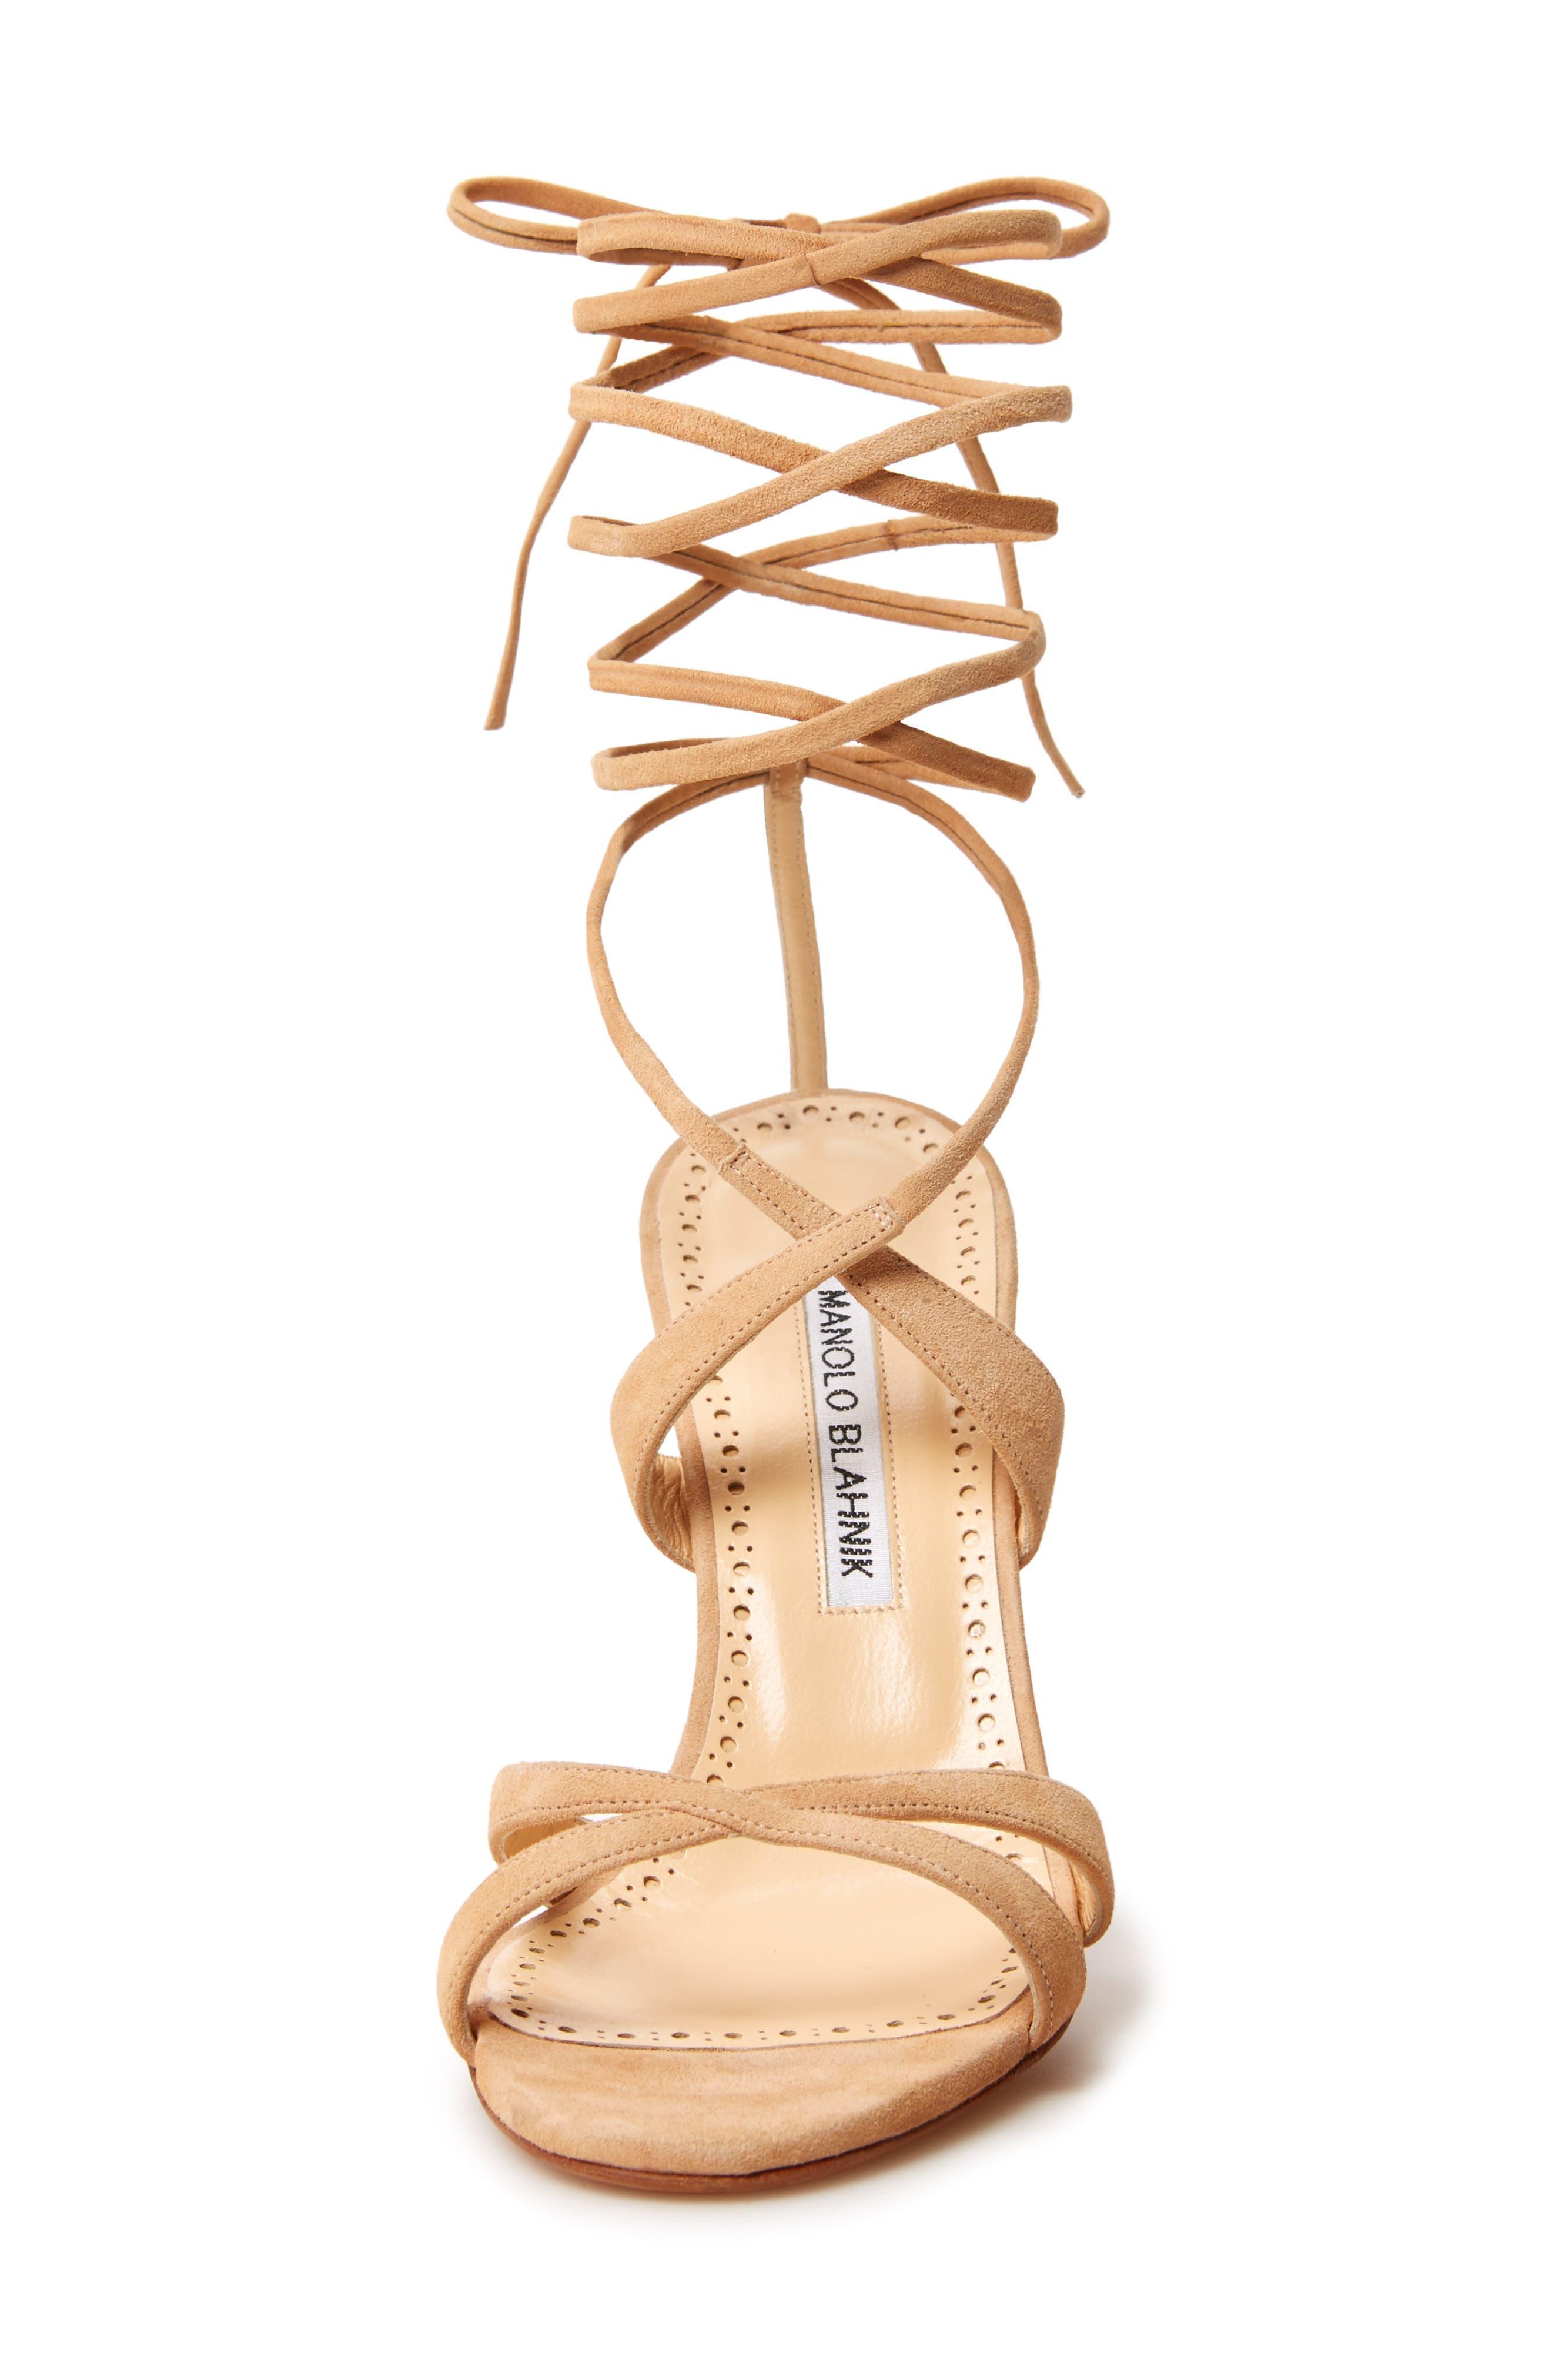 Criss Ankle Tie Sandal,                             Alternate thumbnail 4, color,                             Light Camel